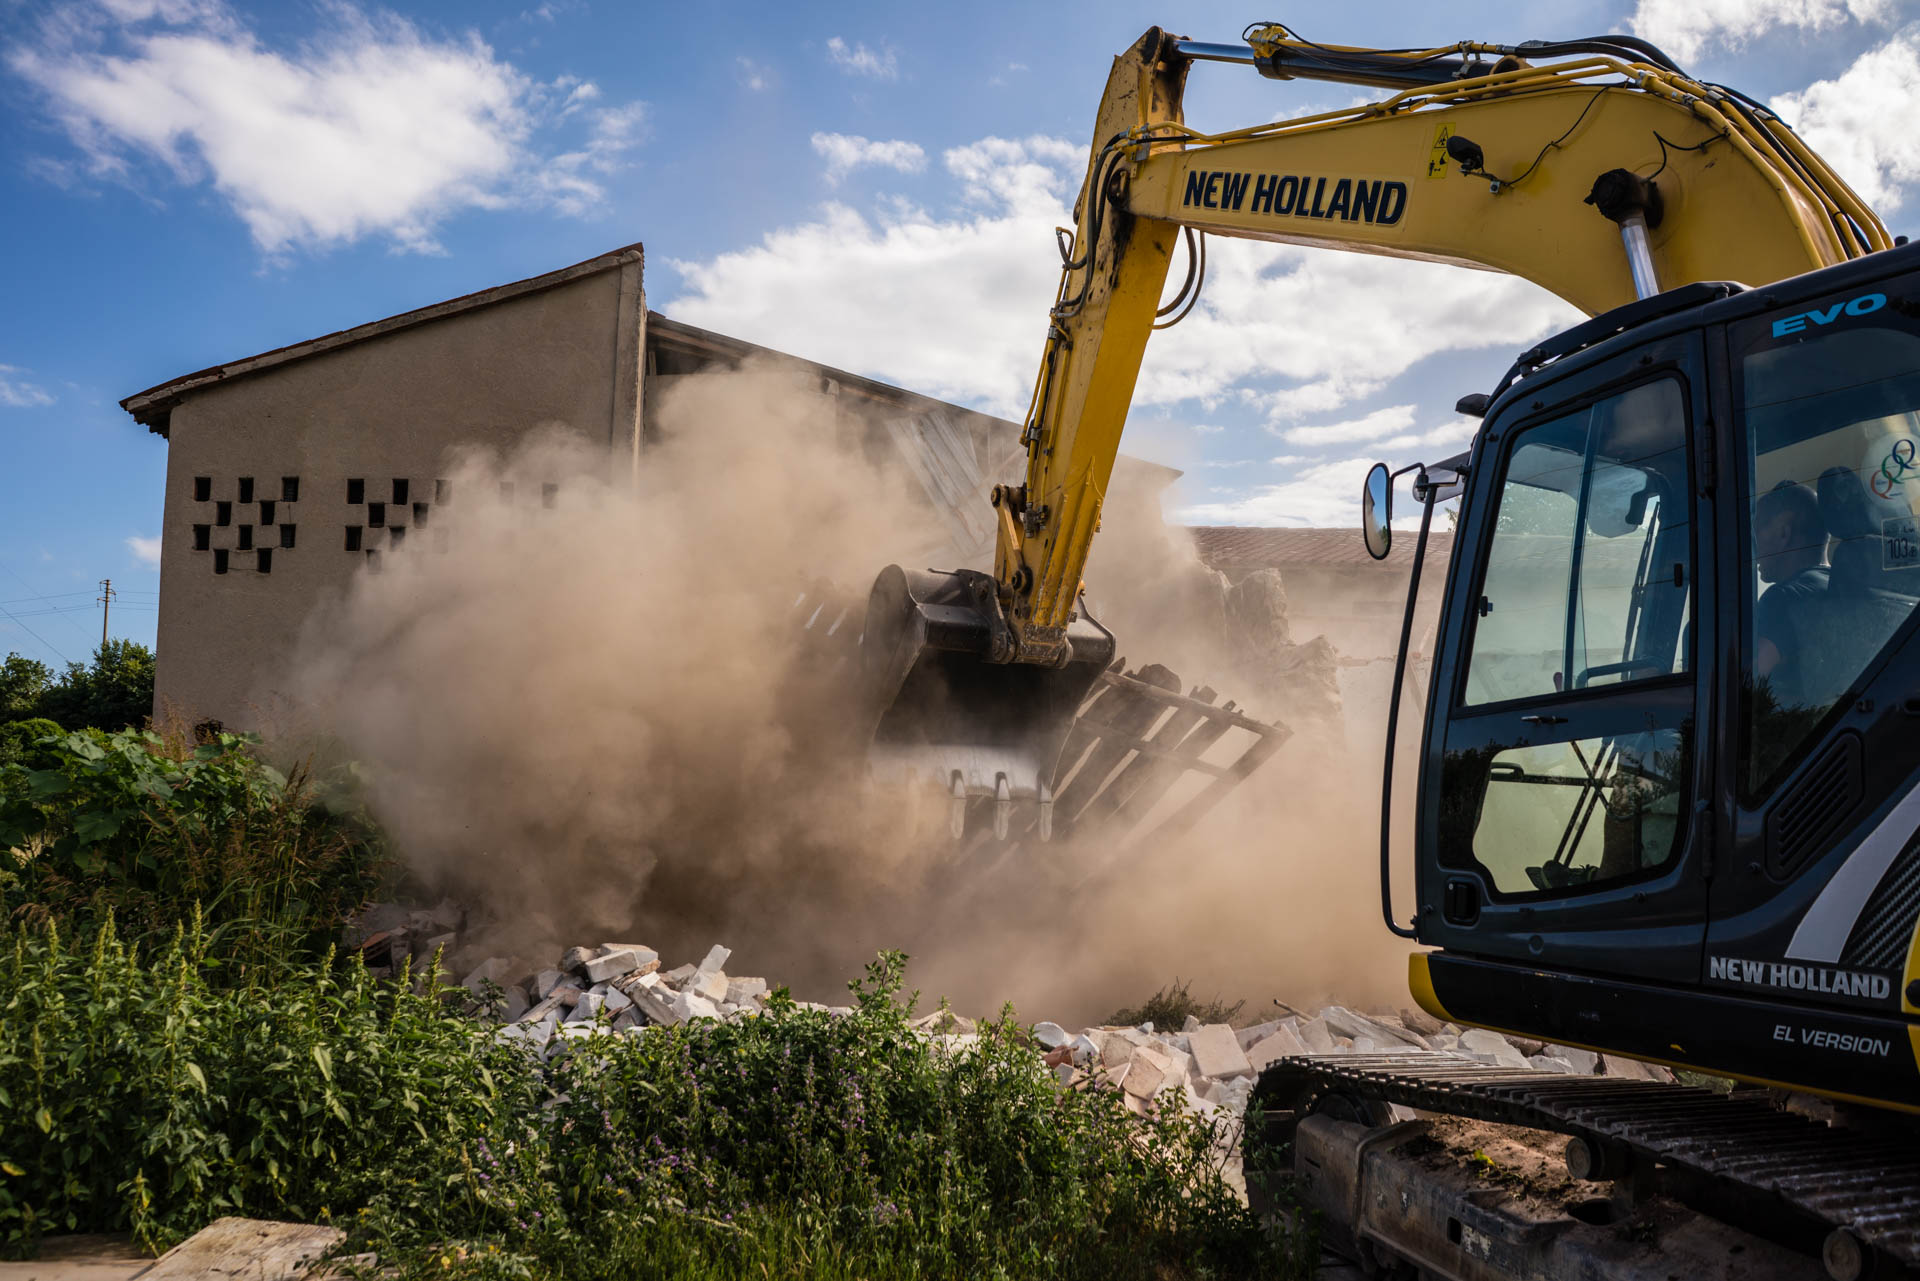 Sartori Fratelli - Demolizioni rapide - Verona, Mantova e province limitrofe